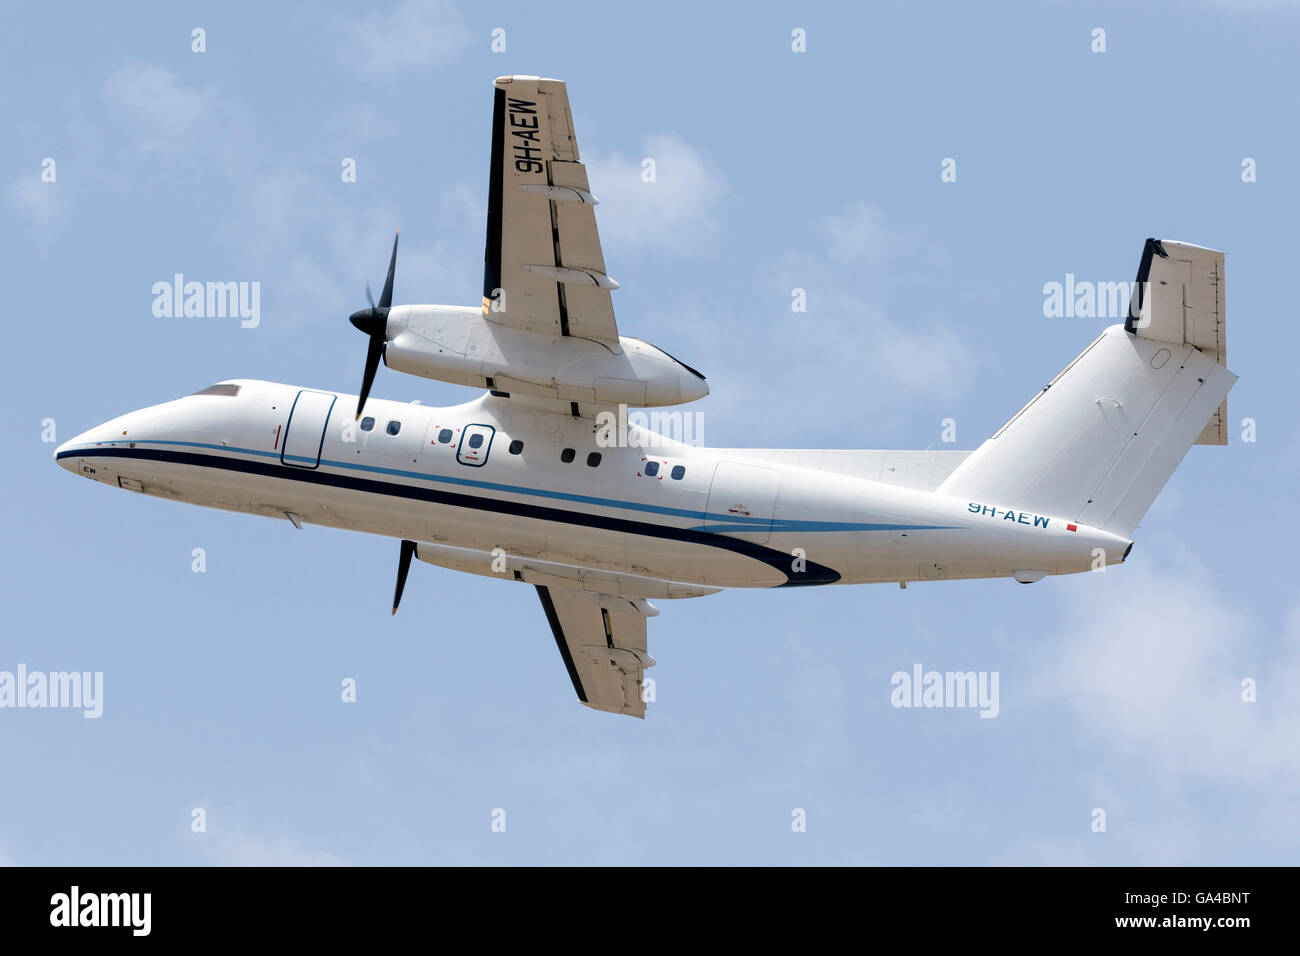 Medavia De Havilland Canada DHC-8 Dash 8 [9H-AEW] climbing out of runway 13. - Stock Image